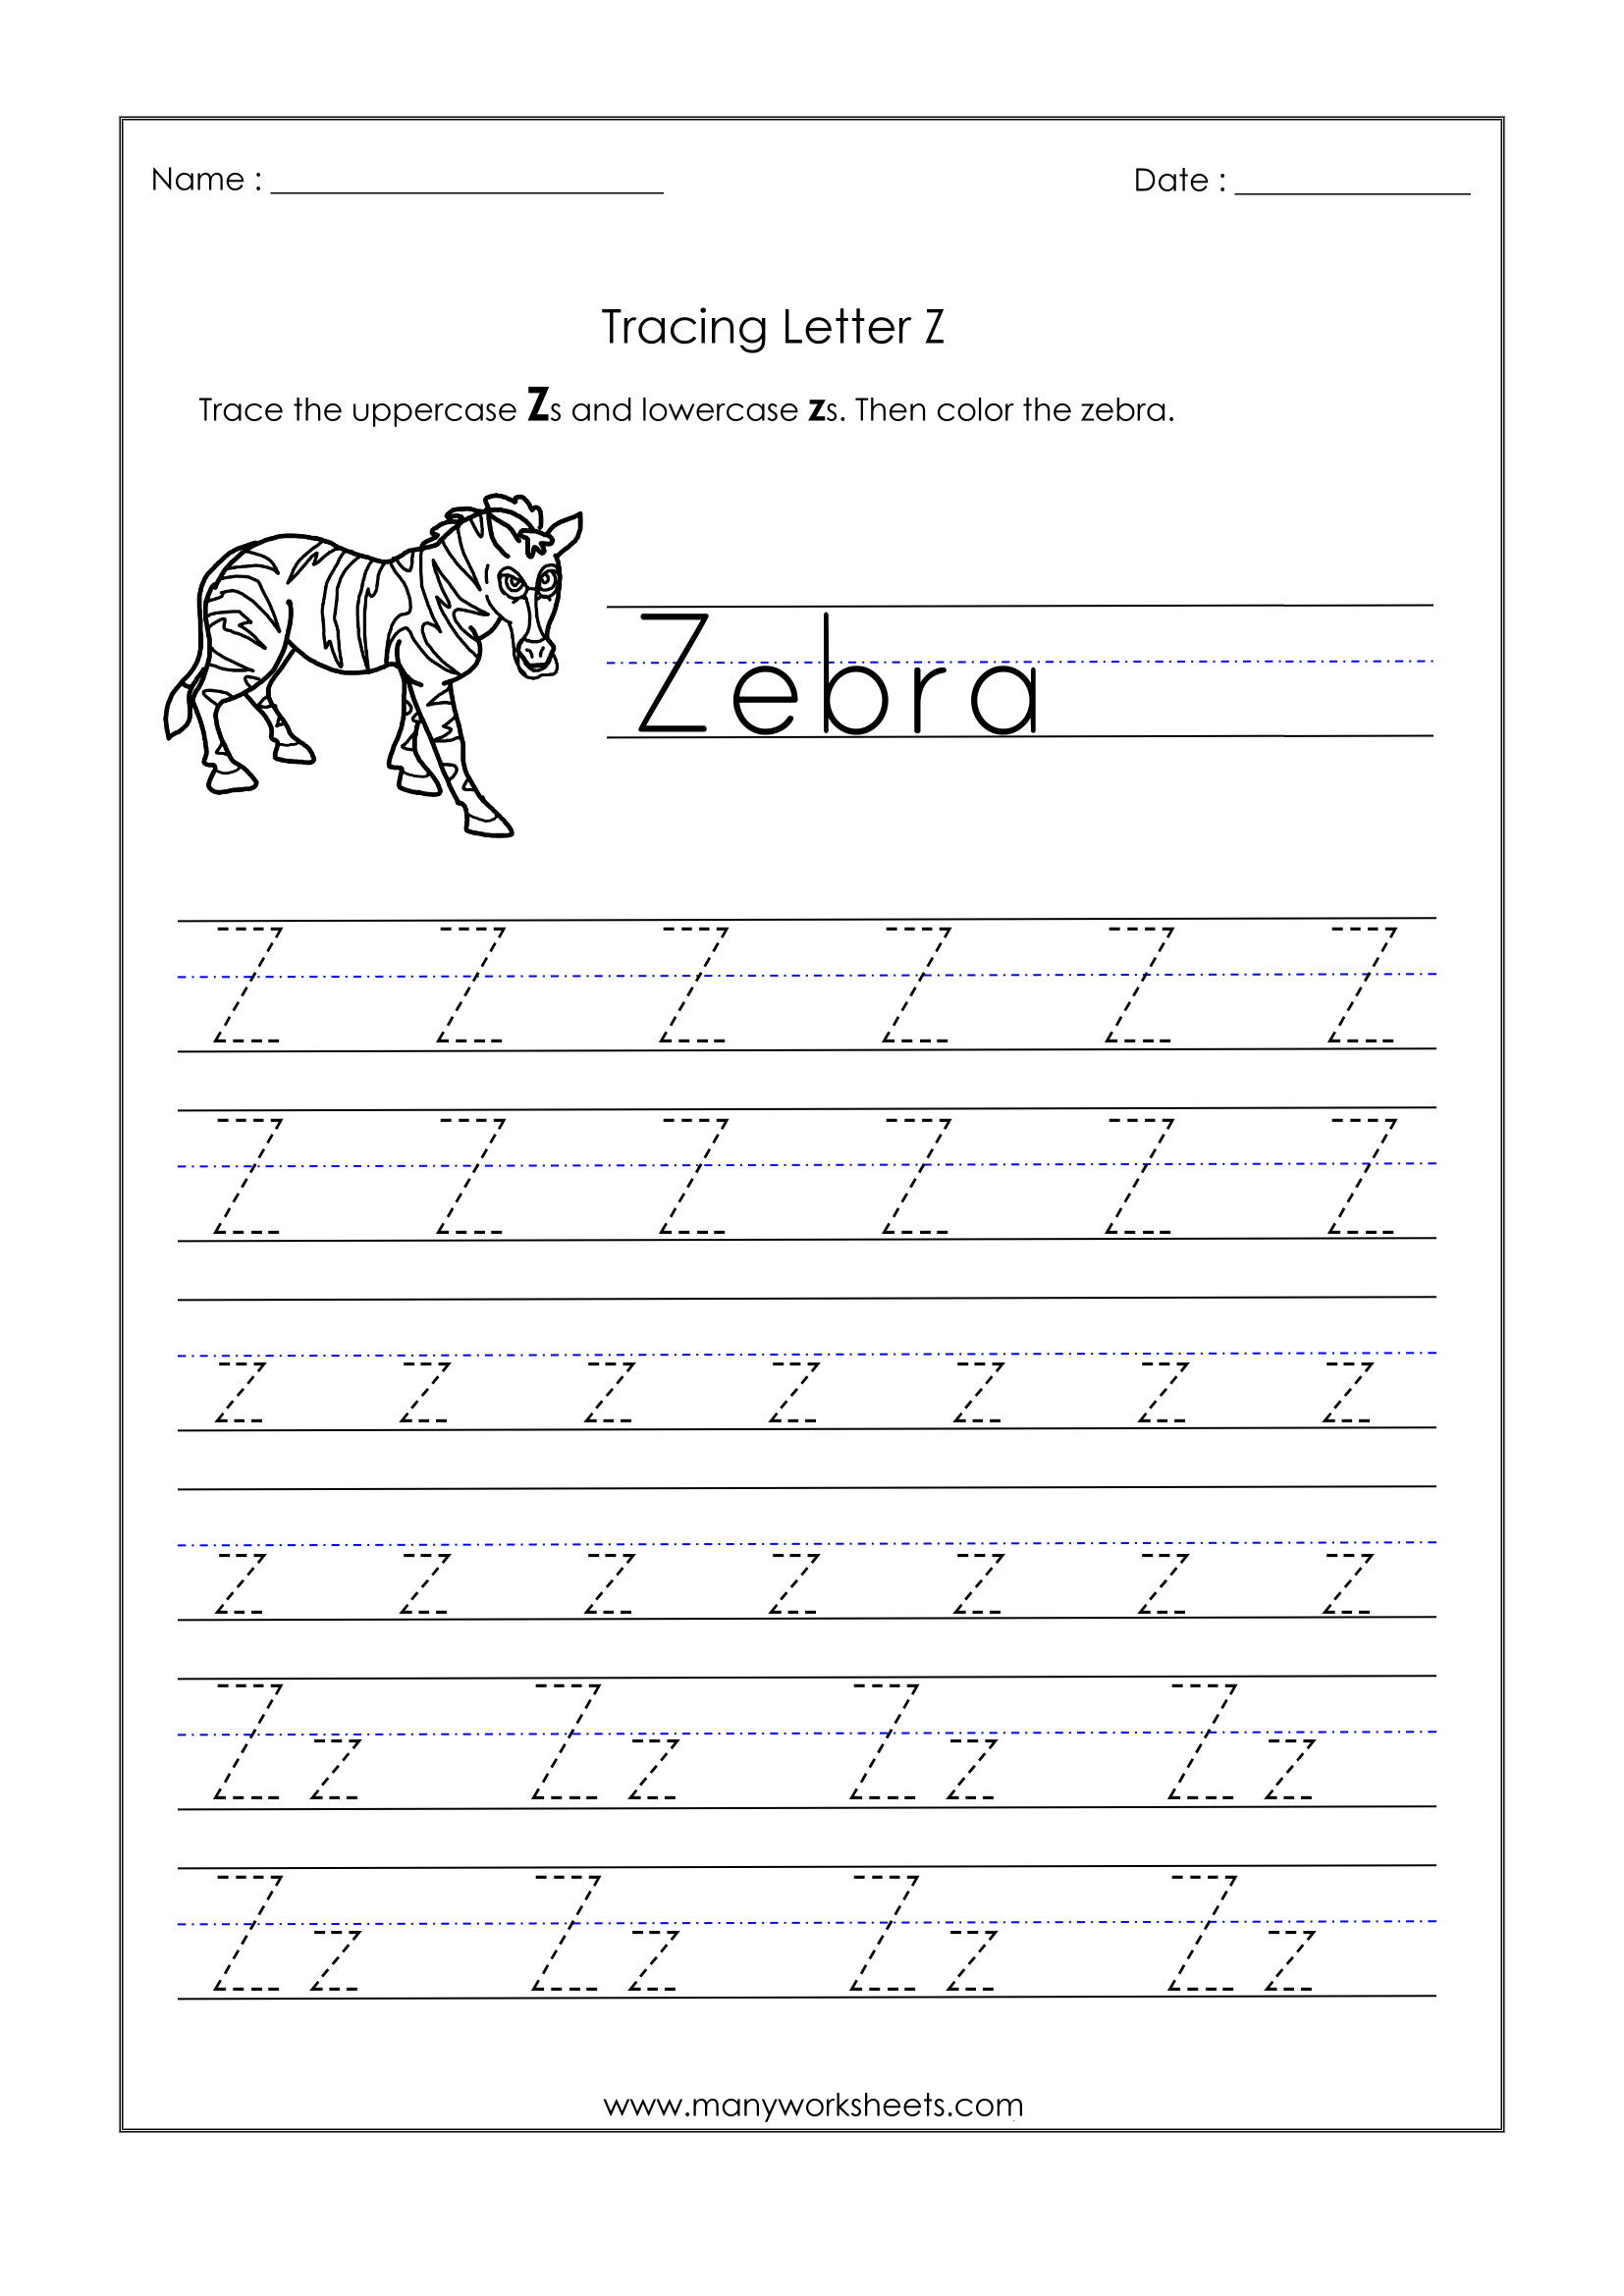 Letter Z Worksheets For Kindergarten – Trace Dotted Letters throughout Letter Z Tracing Worksheets